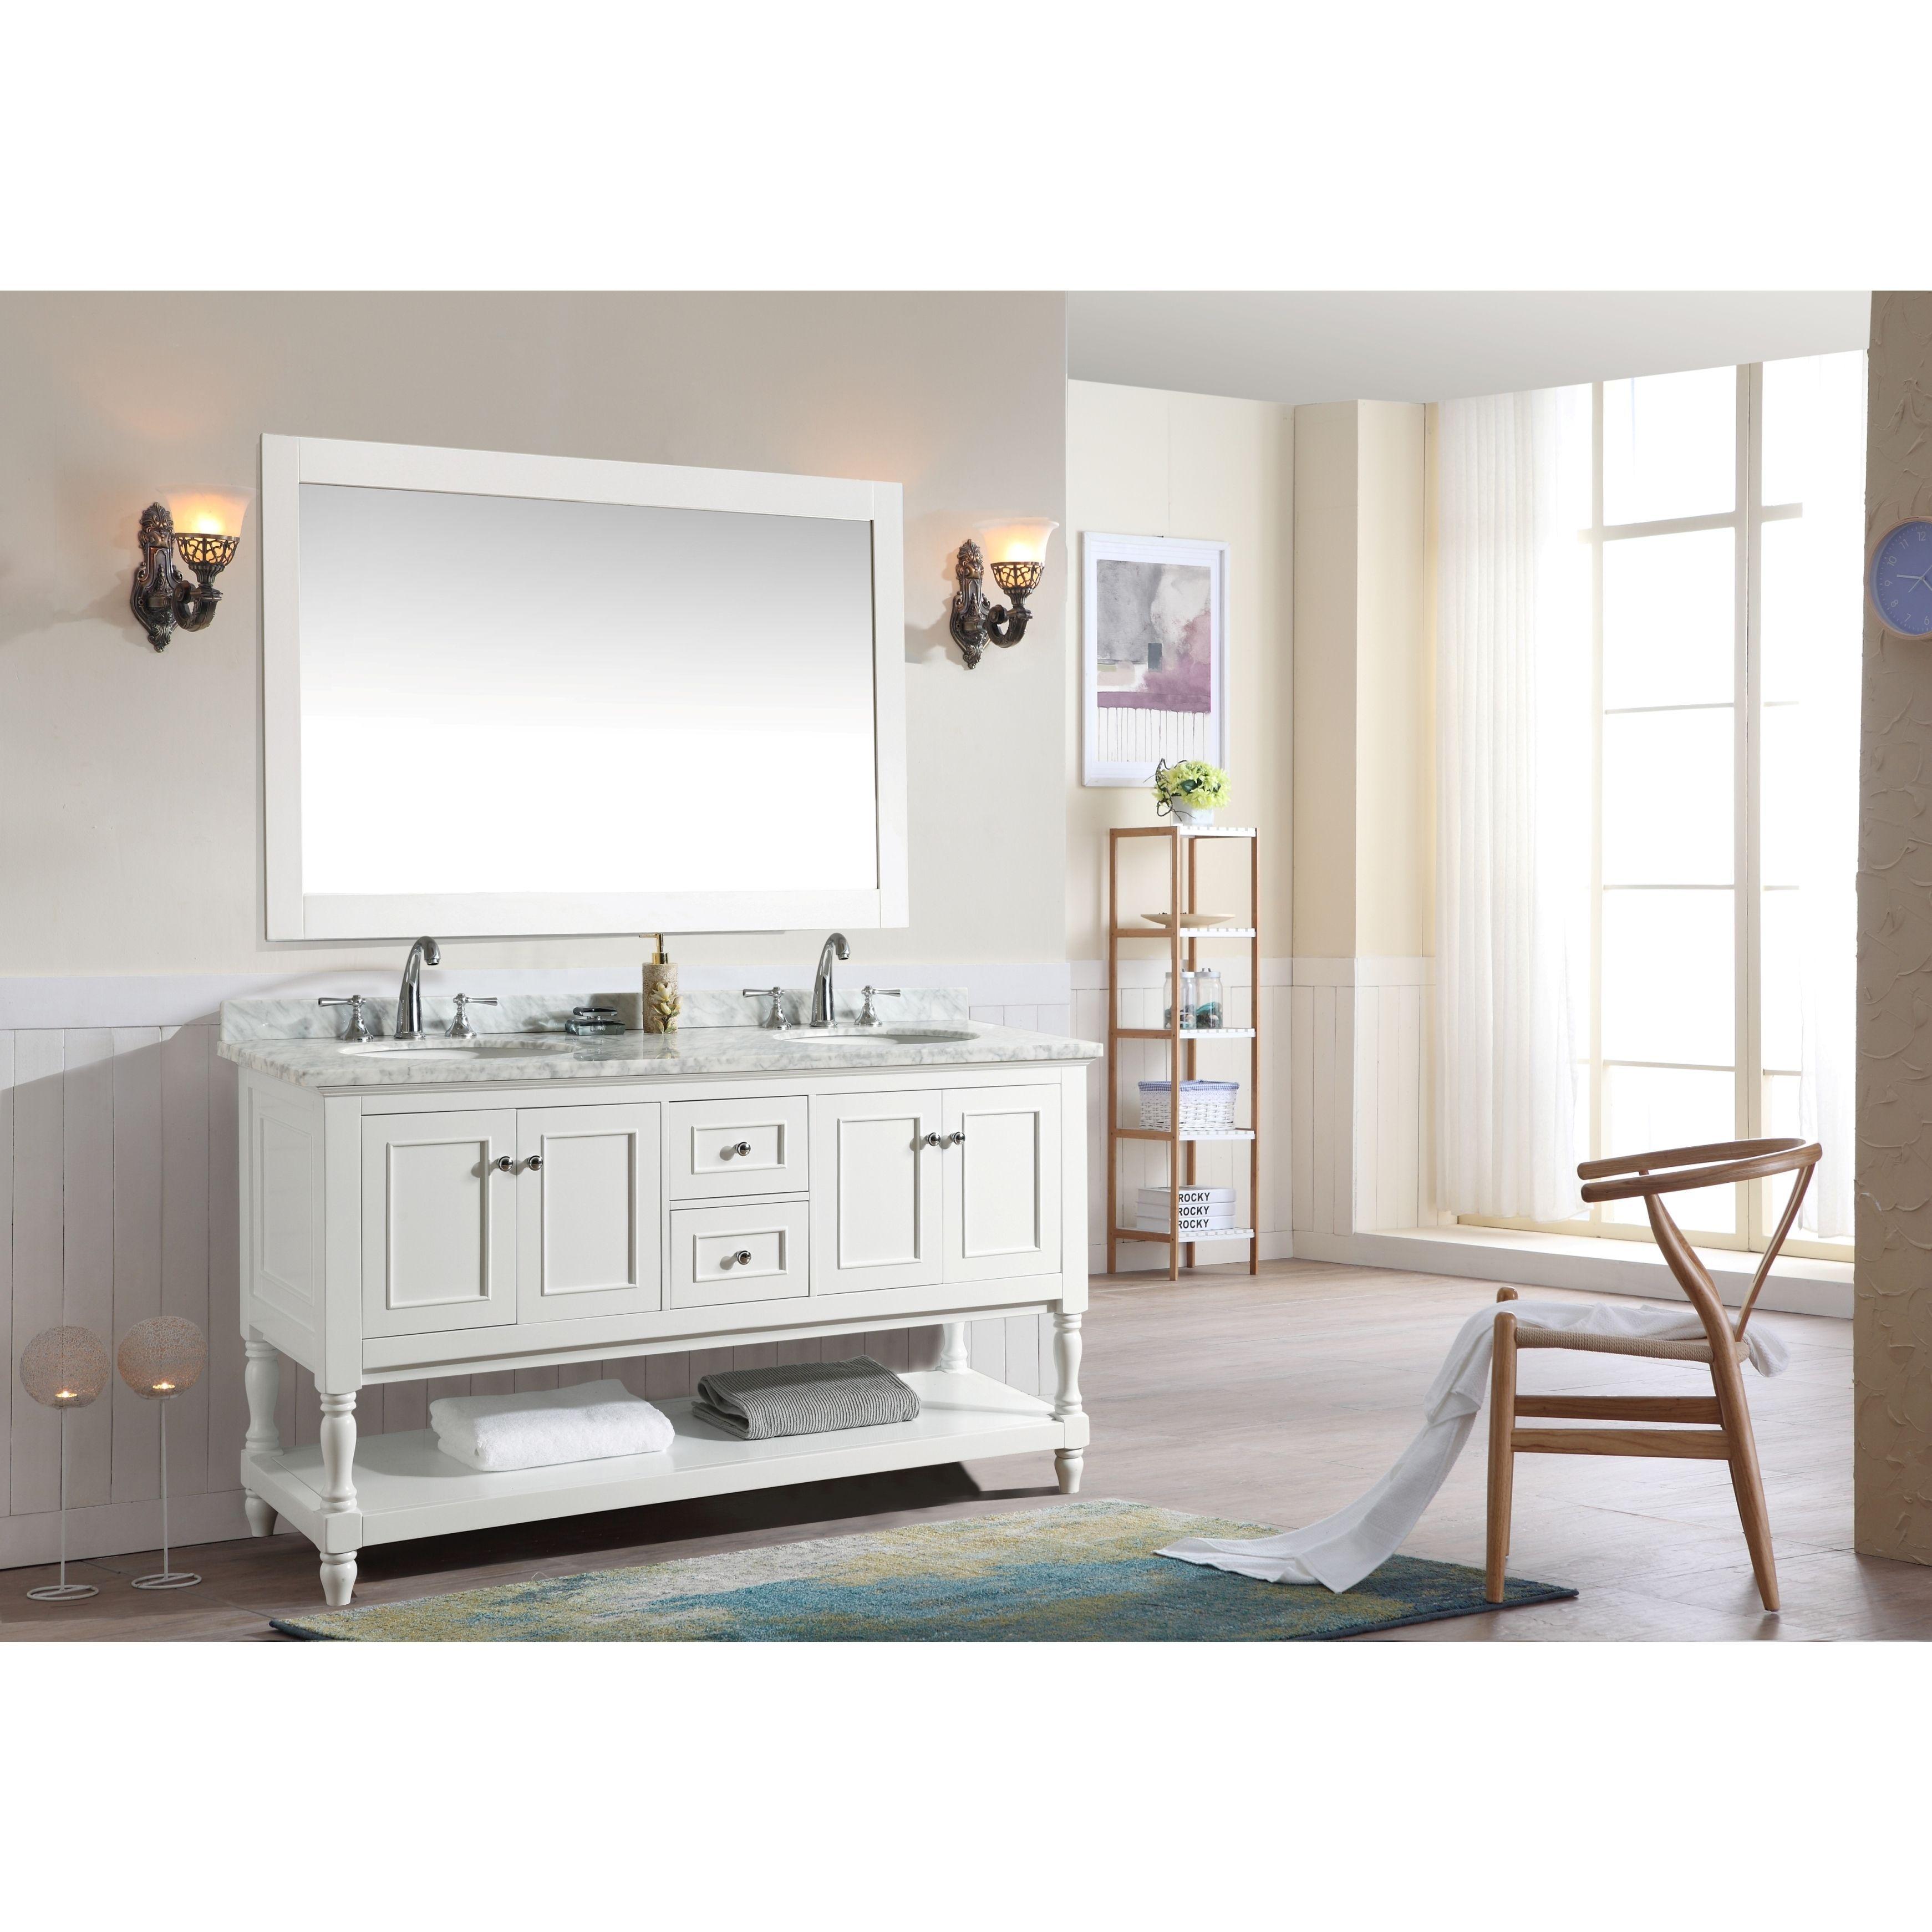 Double sink white bathroom vanities ari cape cod white  inch double bathroom vanity set with mirror